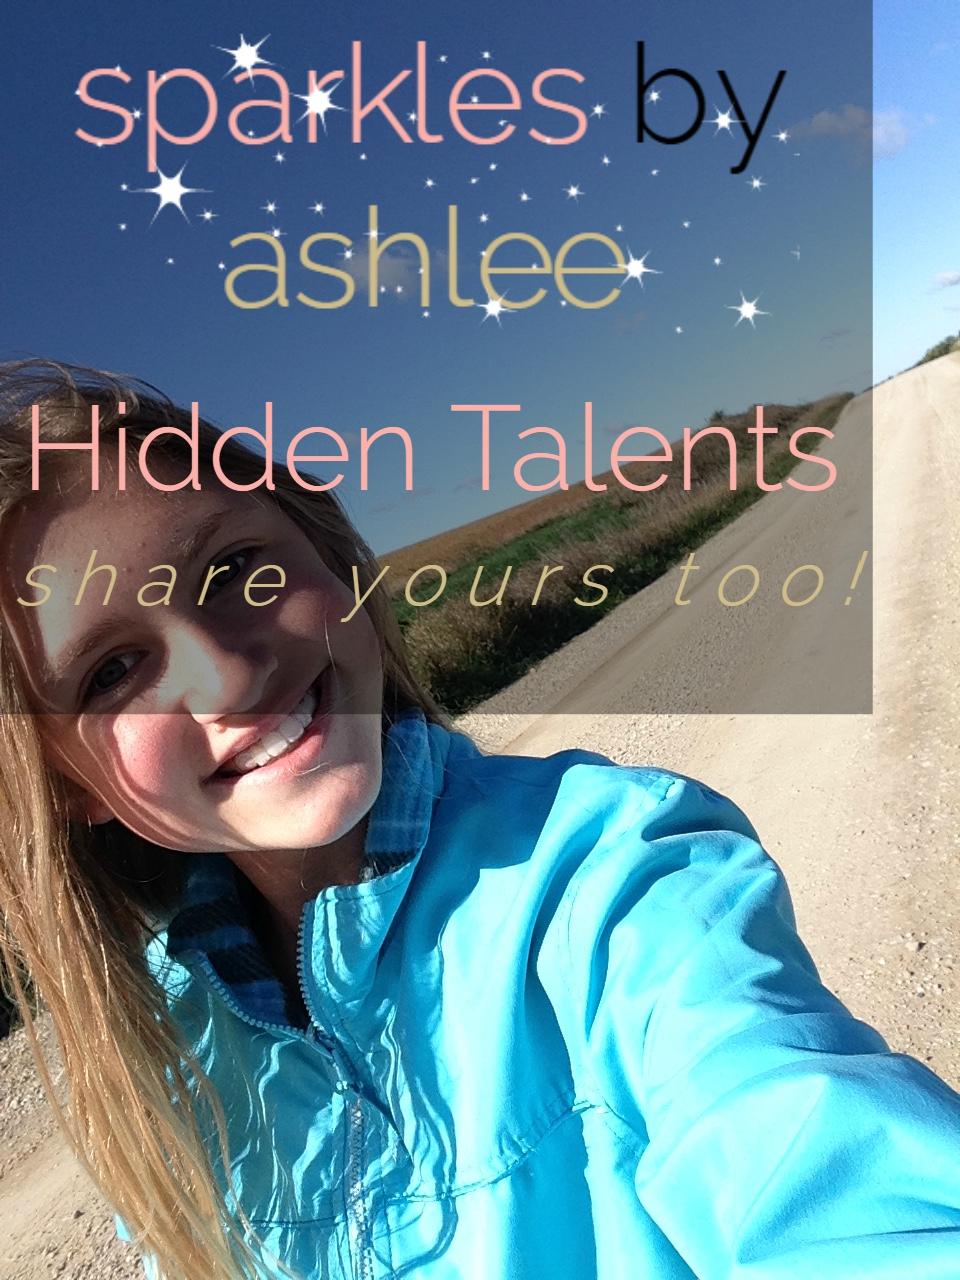 Hidden-Talents-Sparkles-by-Ashlee.jpg